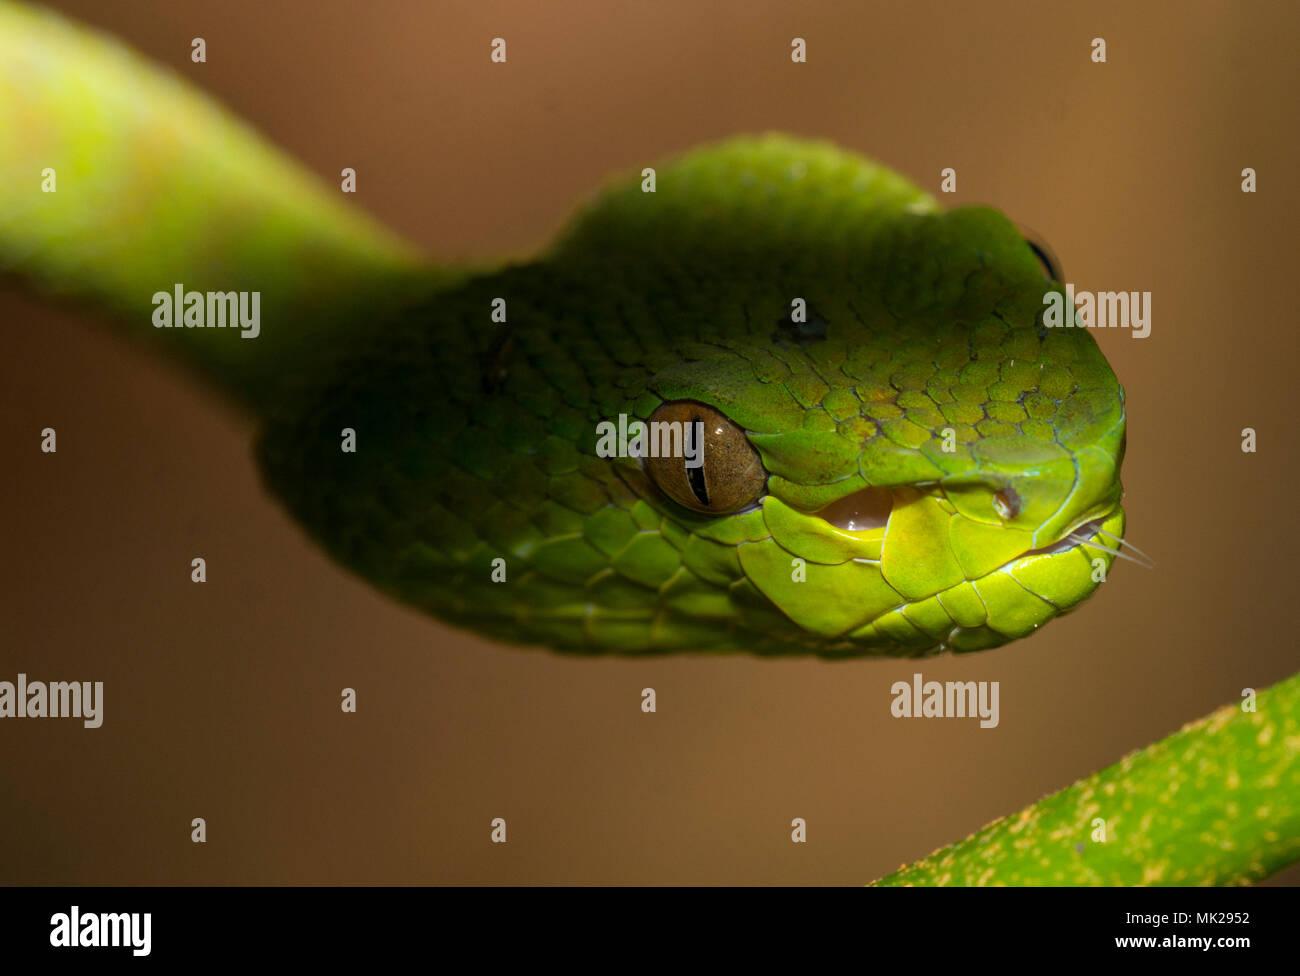 Gorgeous female Phuket Green Pit Viper (Trimeresurus phuketensis) in a tree on Phuket Thailand. - Stock Image